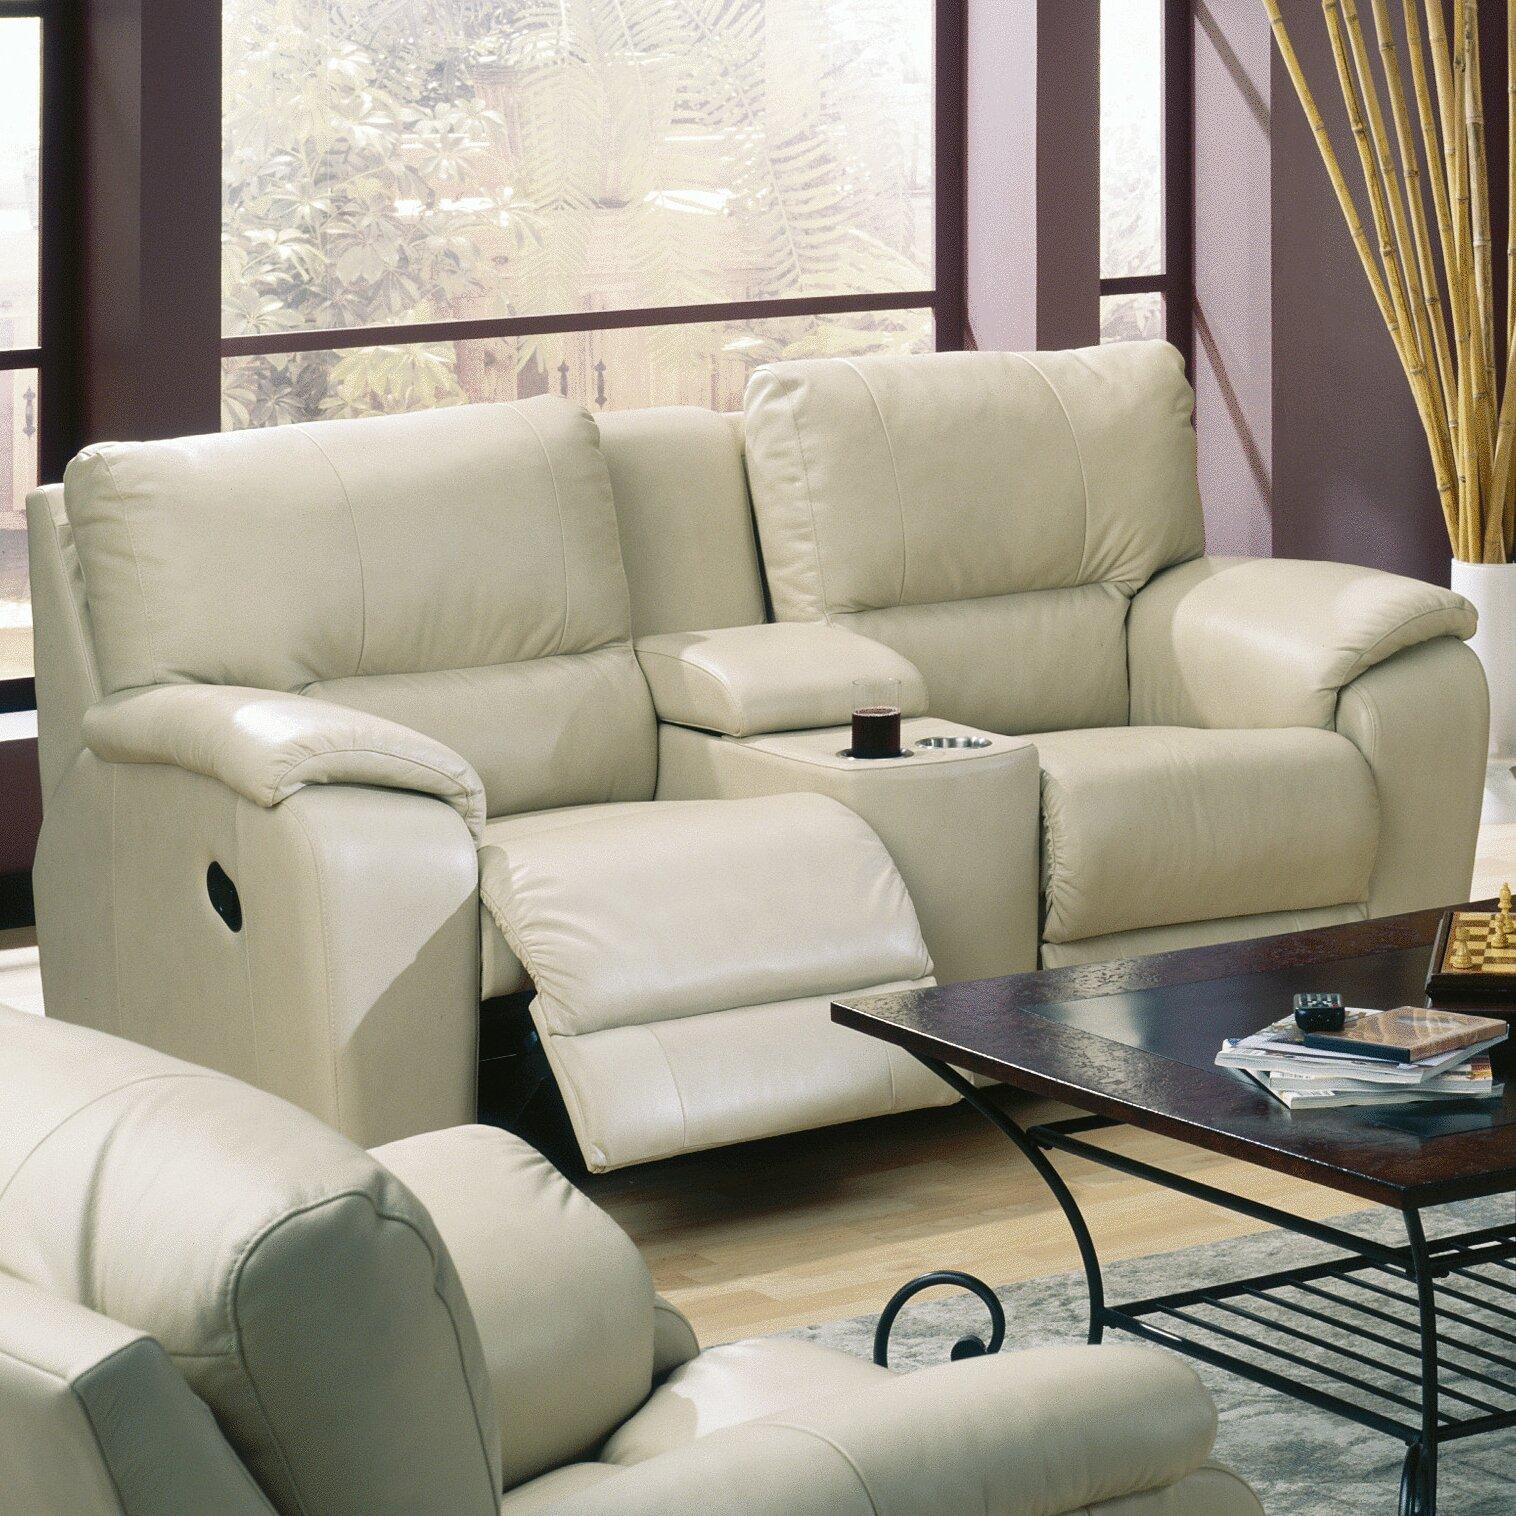 Palliser leather sofa reviews purchase palliser furniture for Palliser sectional leather sofa